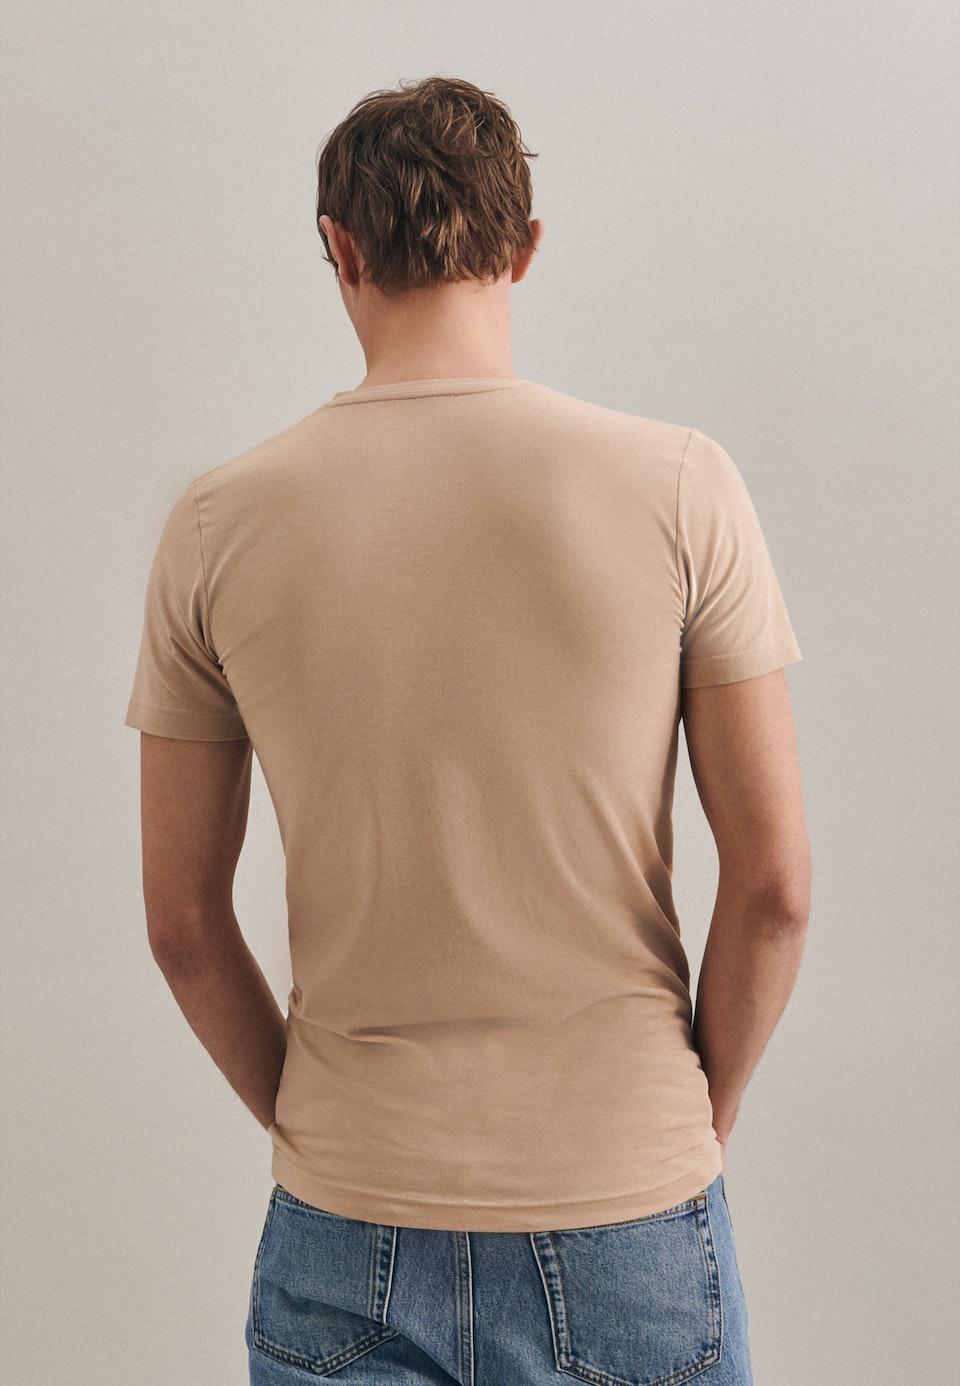 V-Neck T-Shirt made of cotton blend in Brown |  Seidensticker Onlineshop